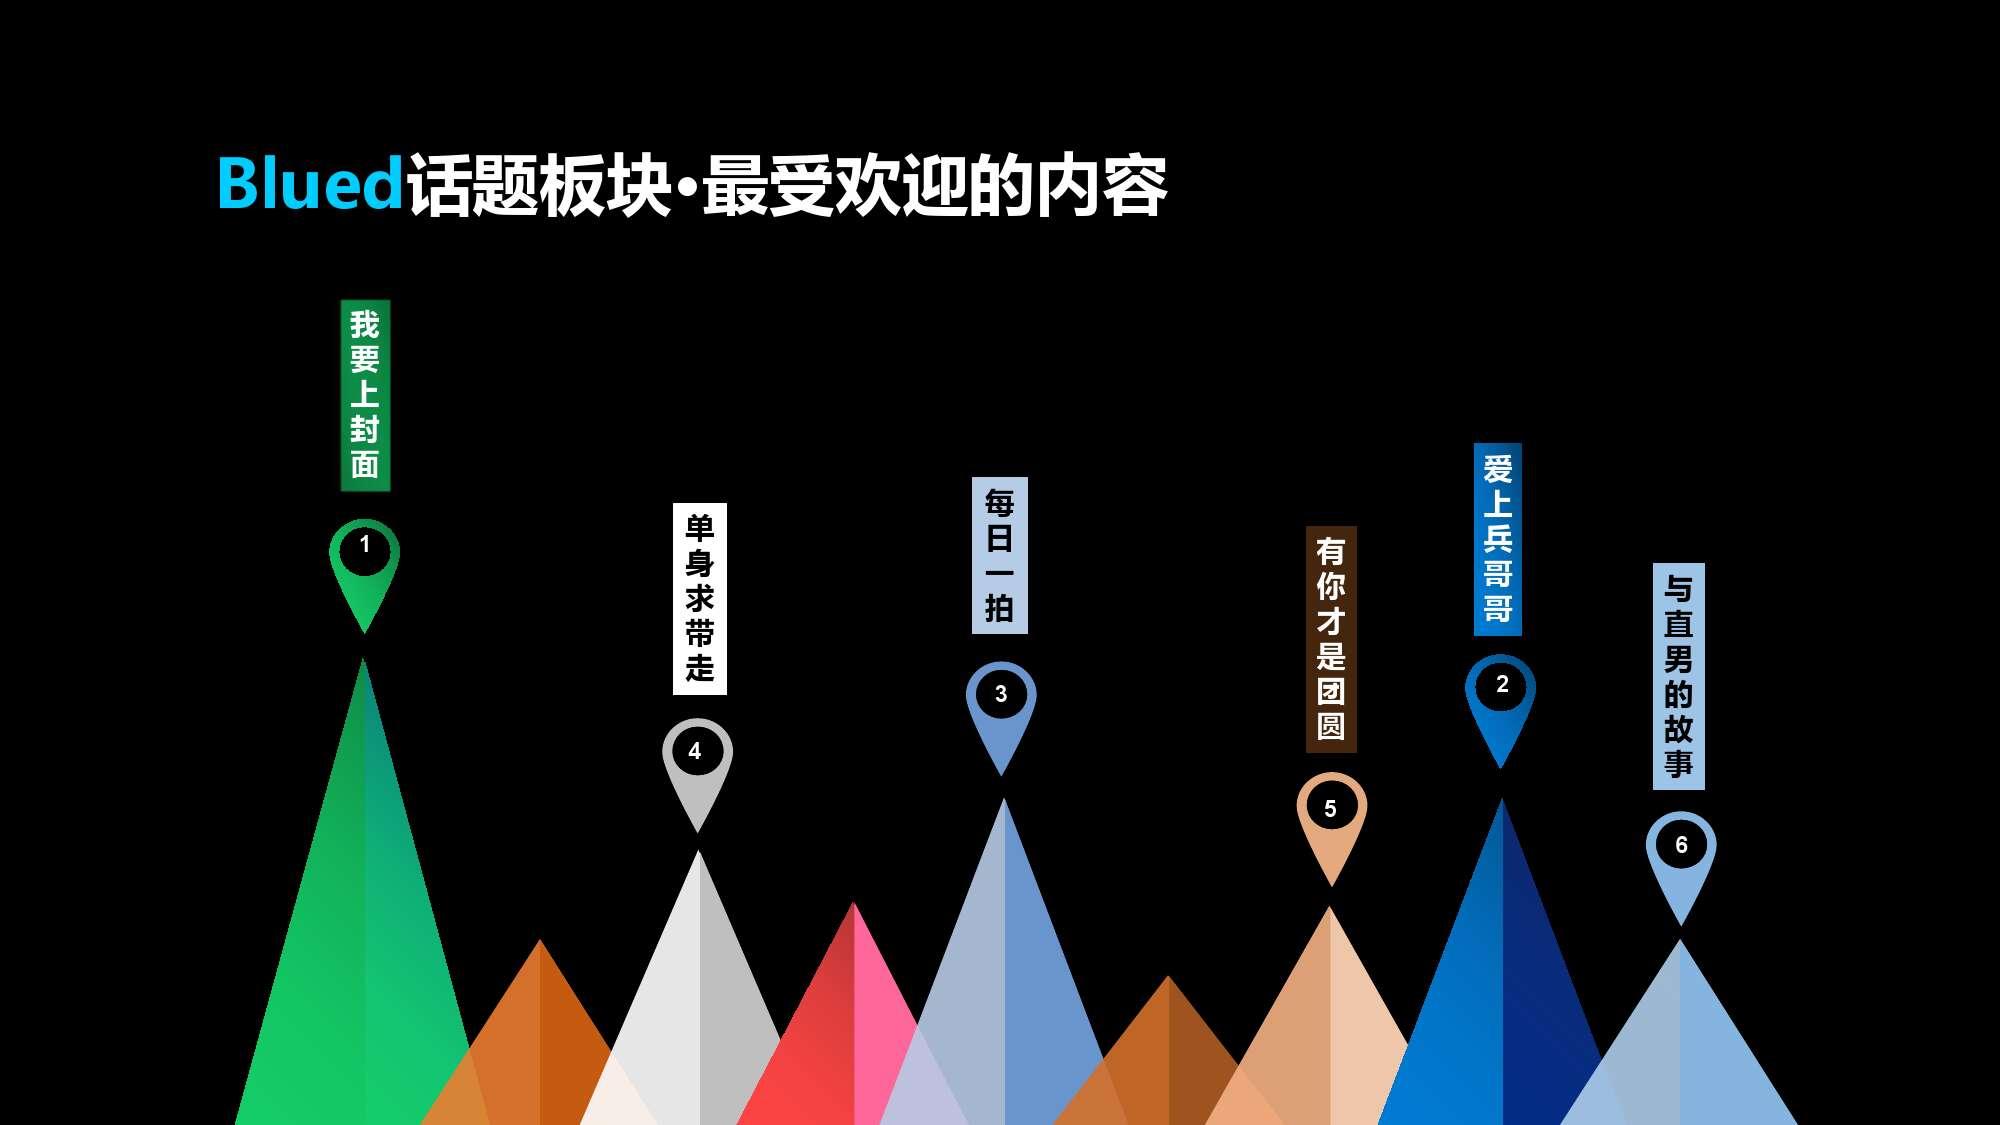 Blued2015中国同志社群大数据白皮书_000022